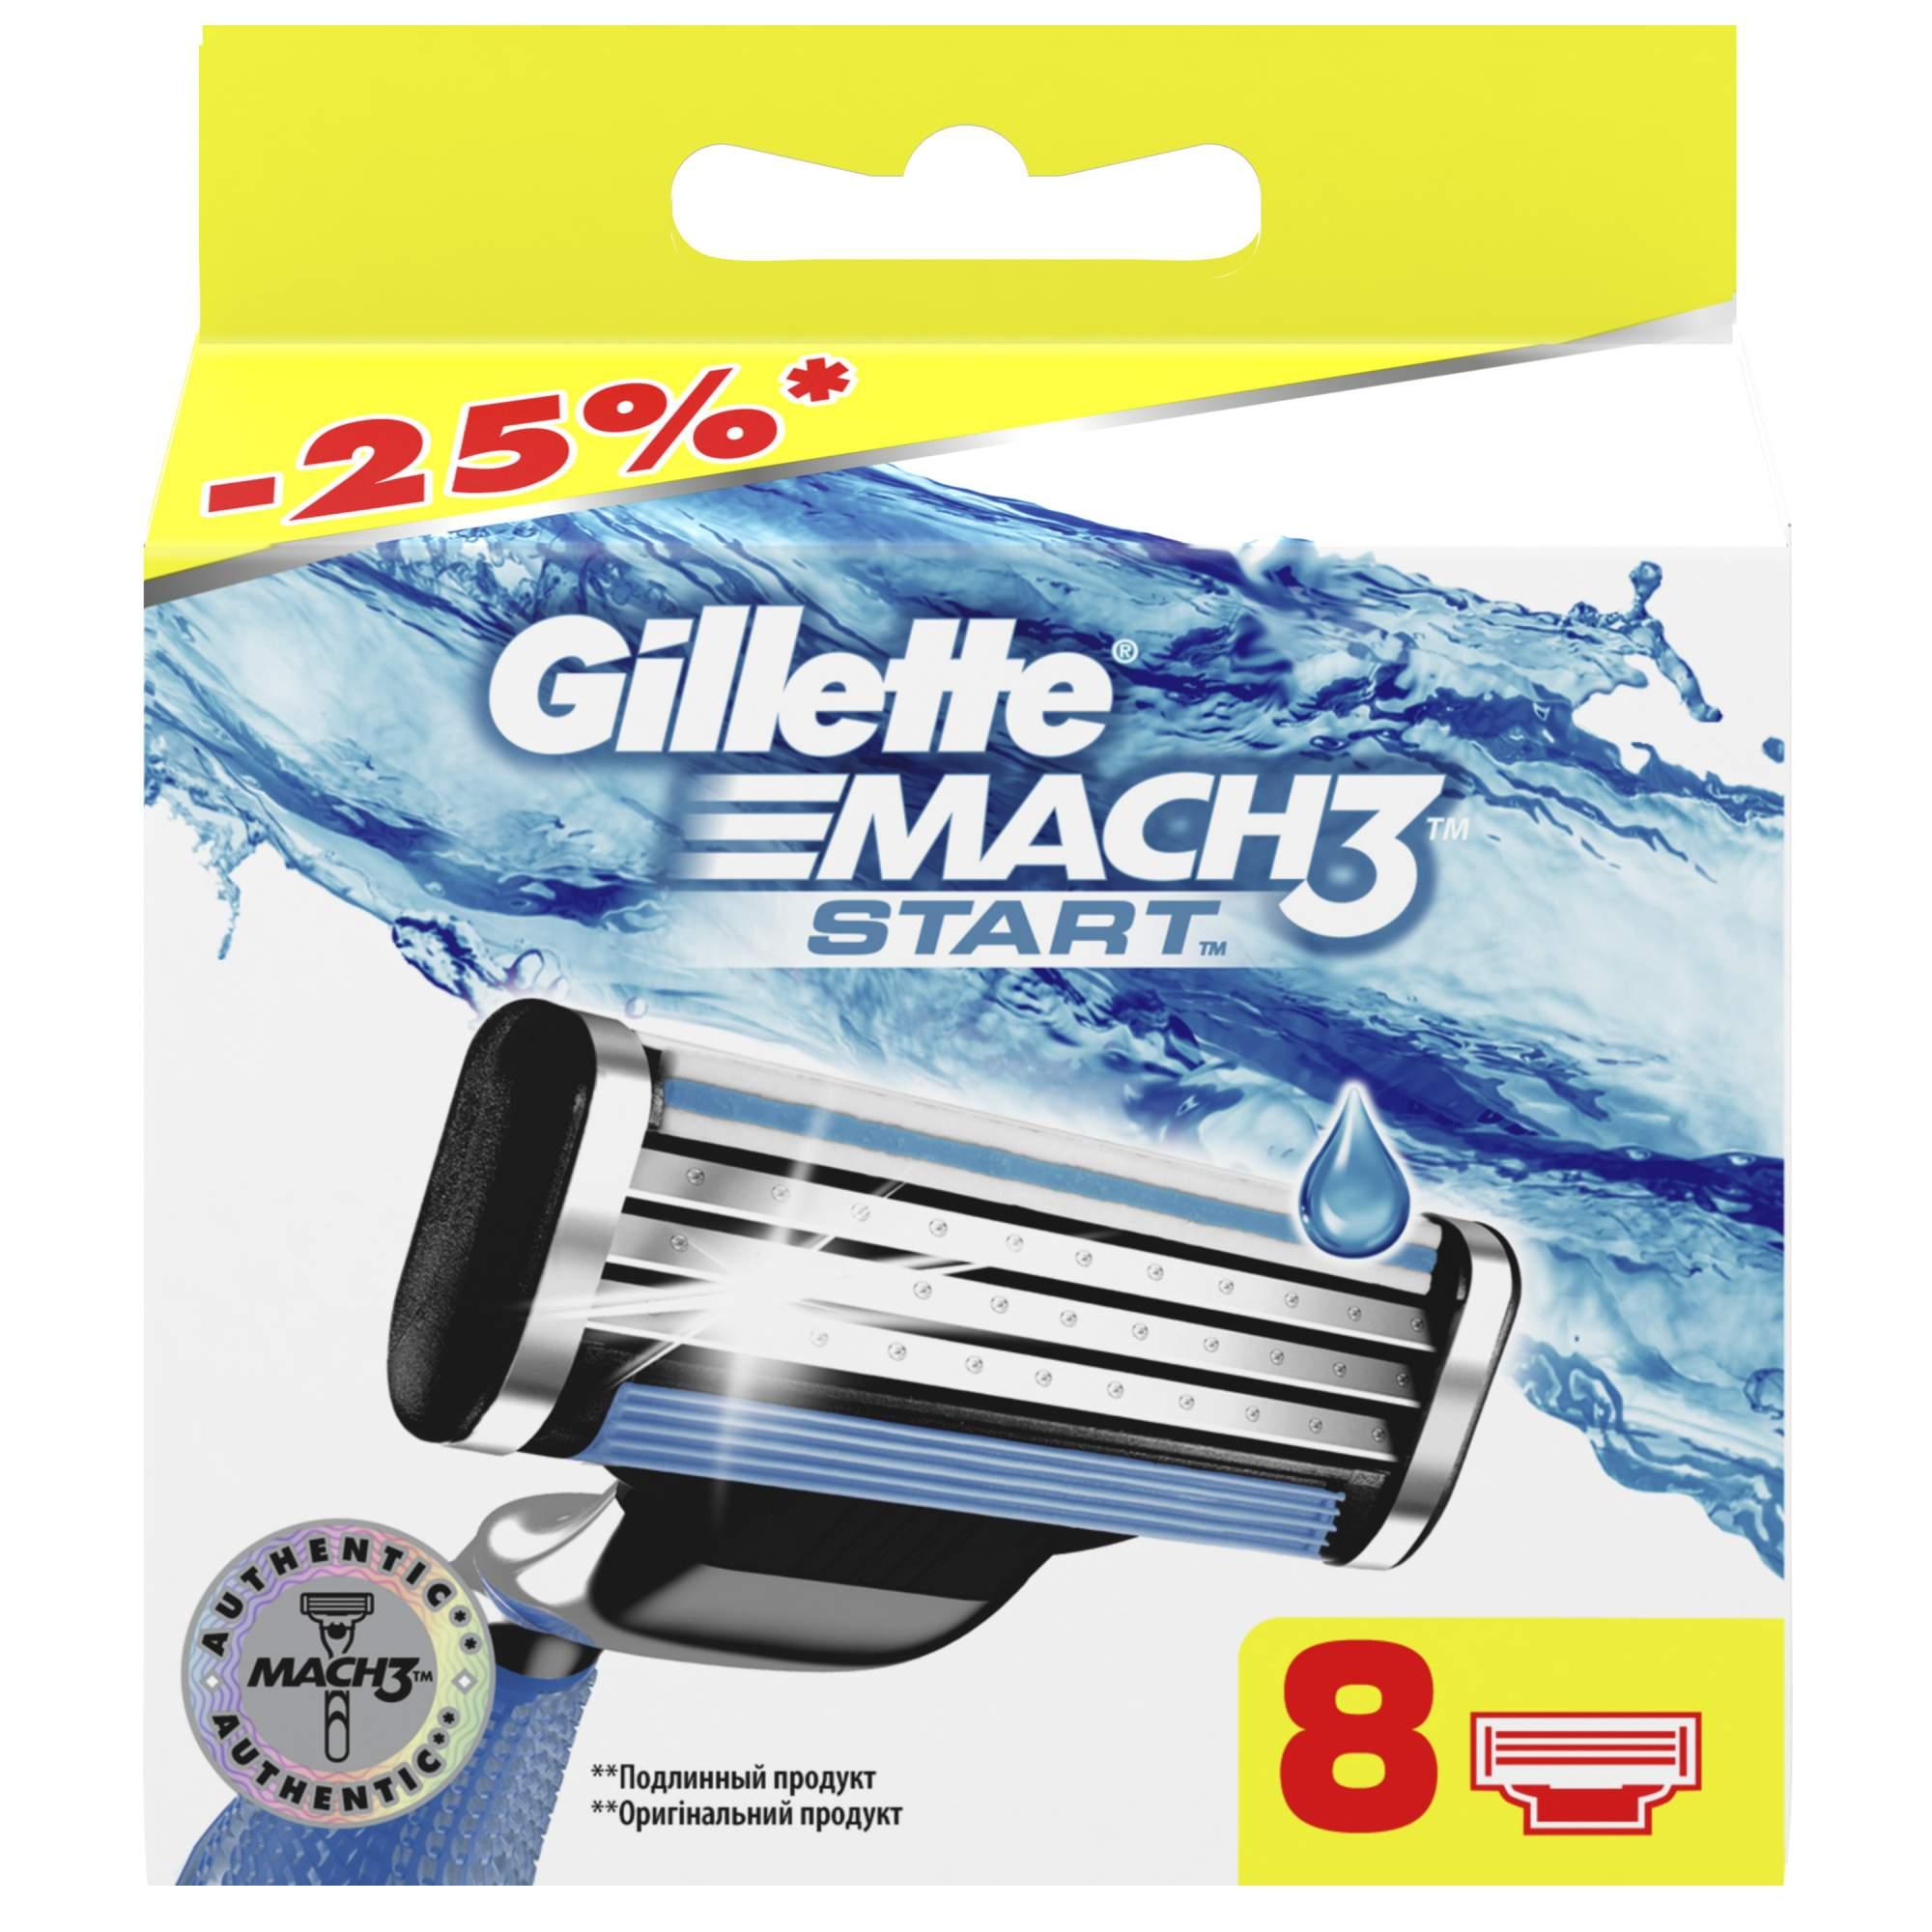 Сменные кассеты Gillette Mach3 Start 8 шт